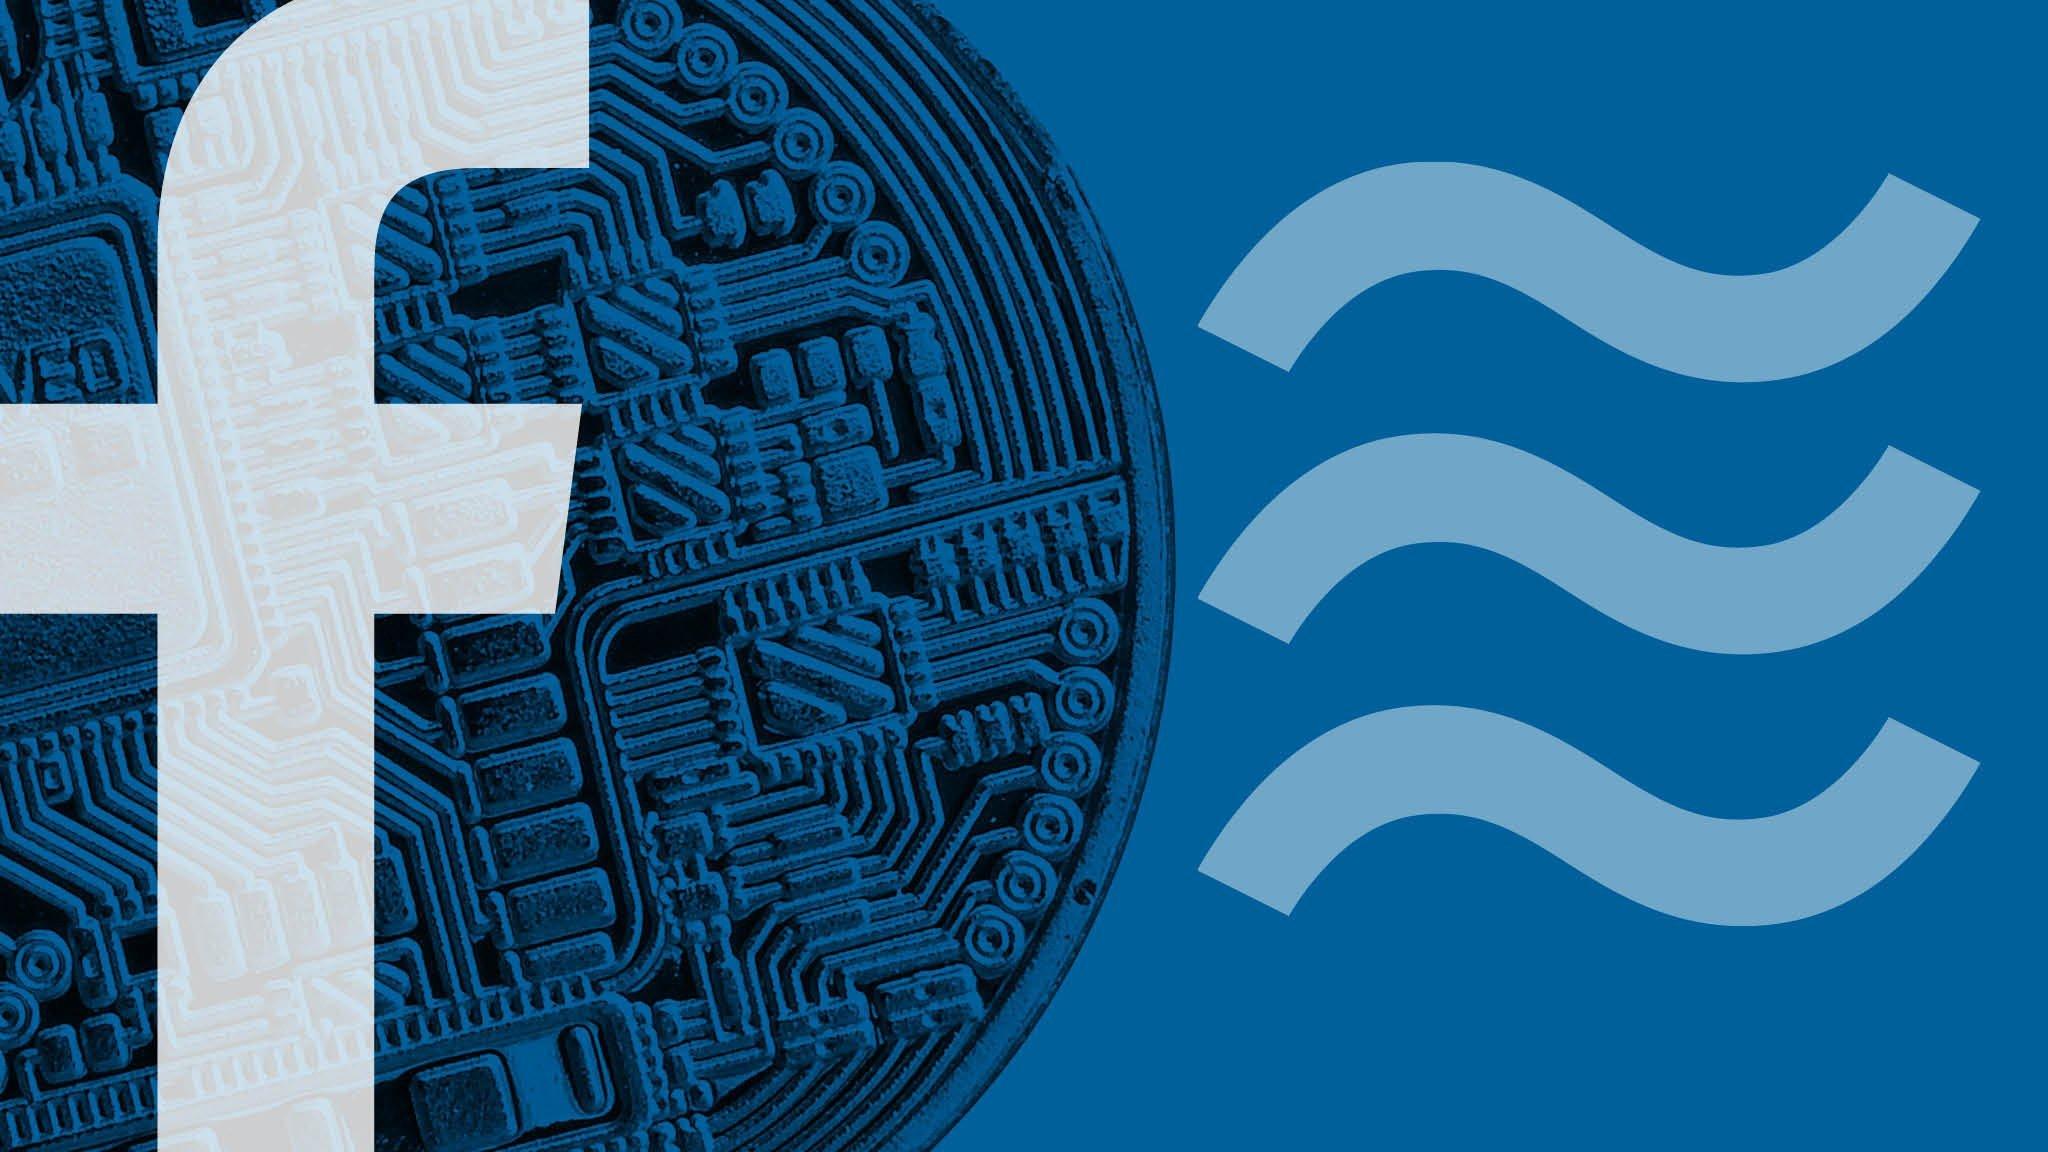 Federal Reserve sets out regulatory challenges facing Facebook's Libra